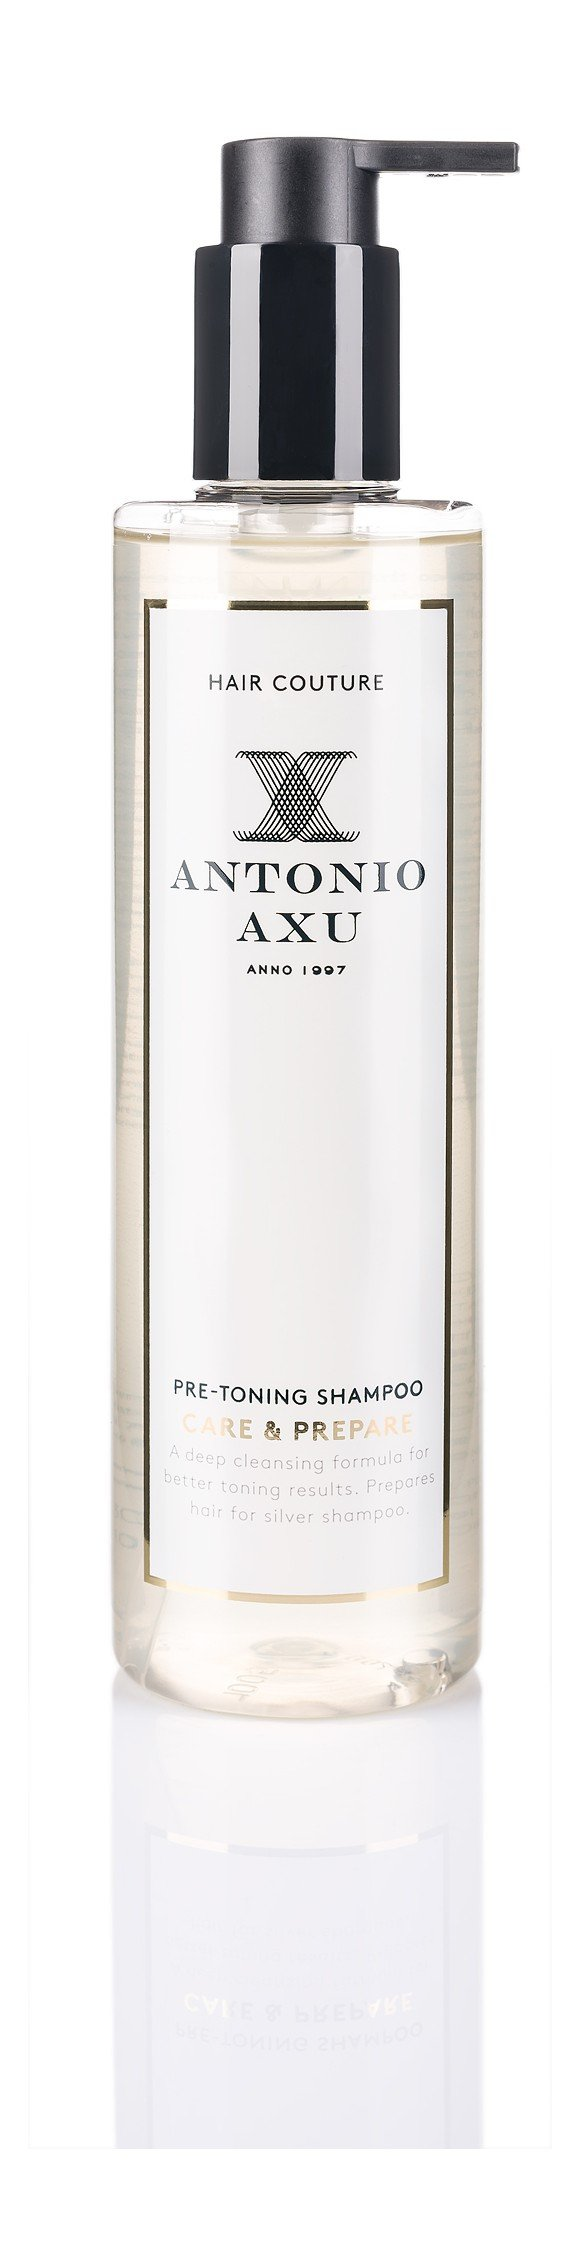 Antonio Axu - Care & Prepare Shampoo 300 ml